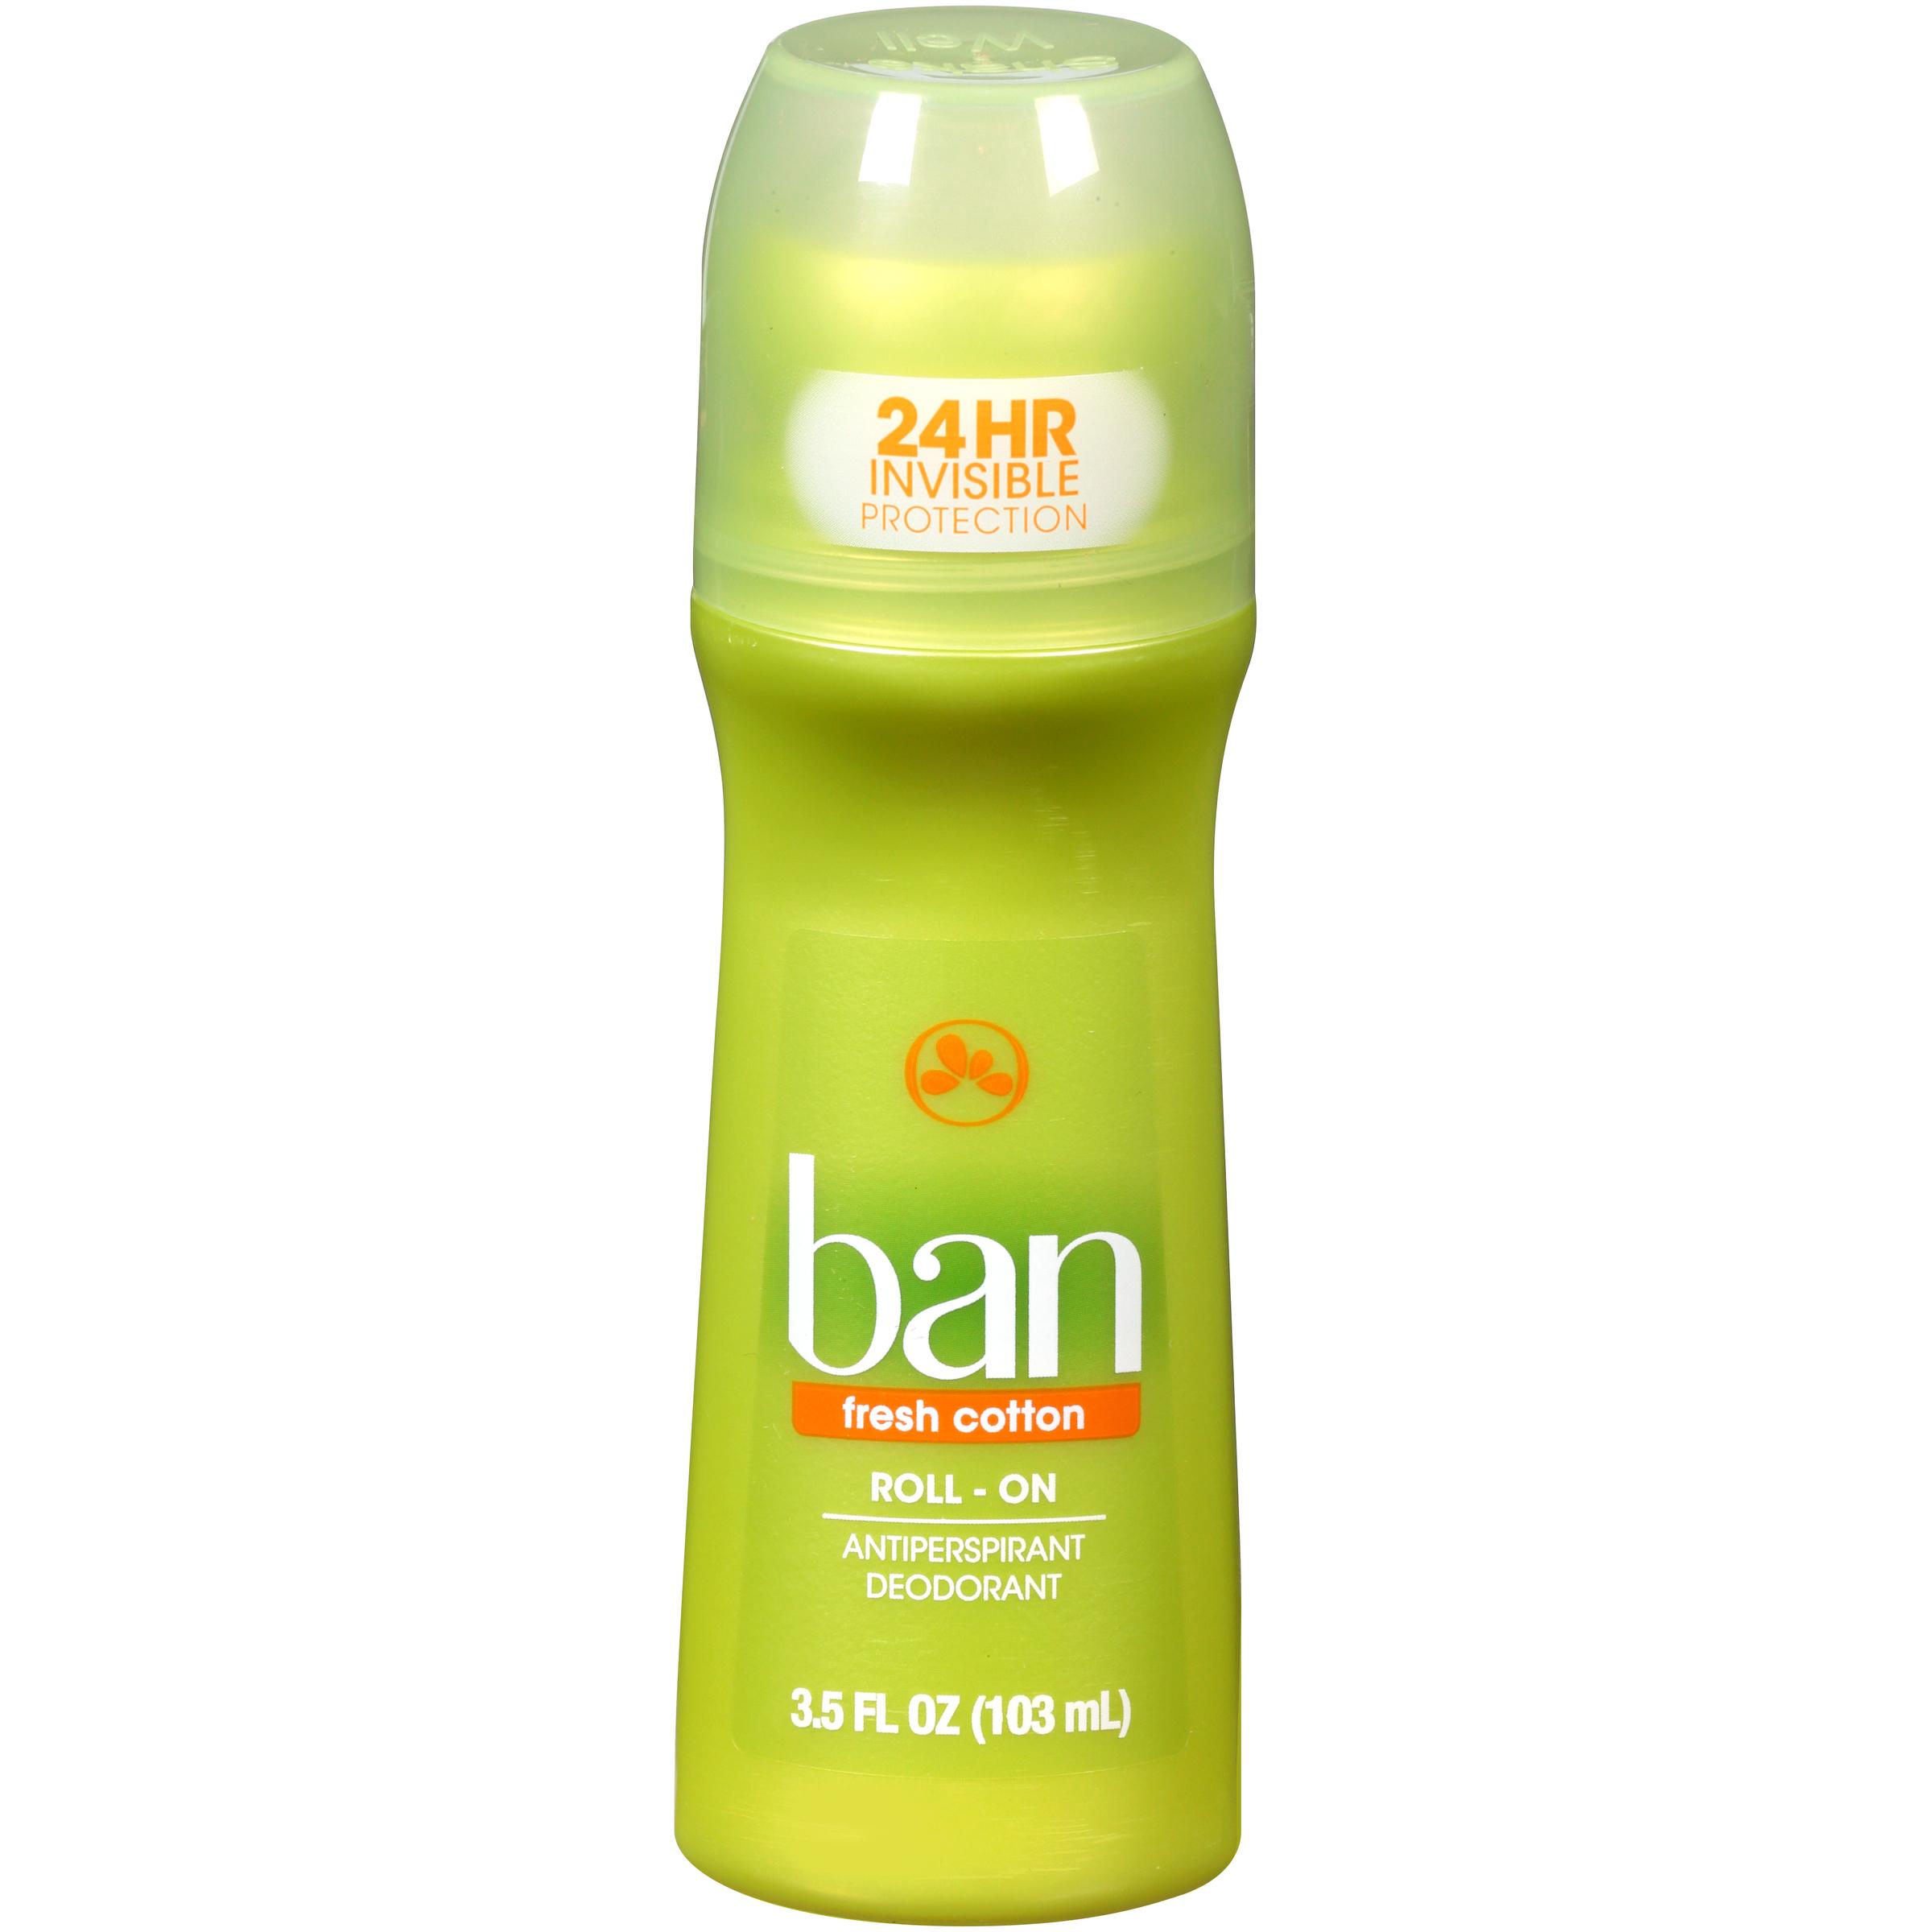 BAN Antiperspirant/Deodorant, Original Roll-On, Fresh Cotton, 3.5 fl oz (103 ml), Size: 3.5 oz. im test